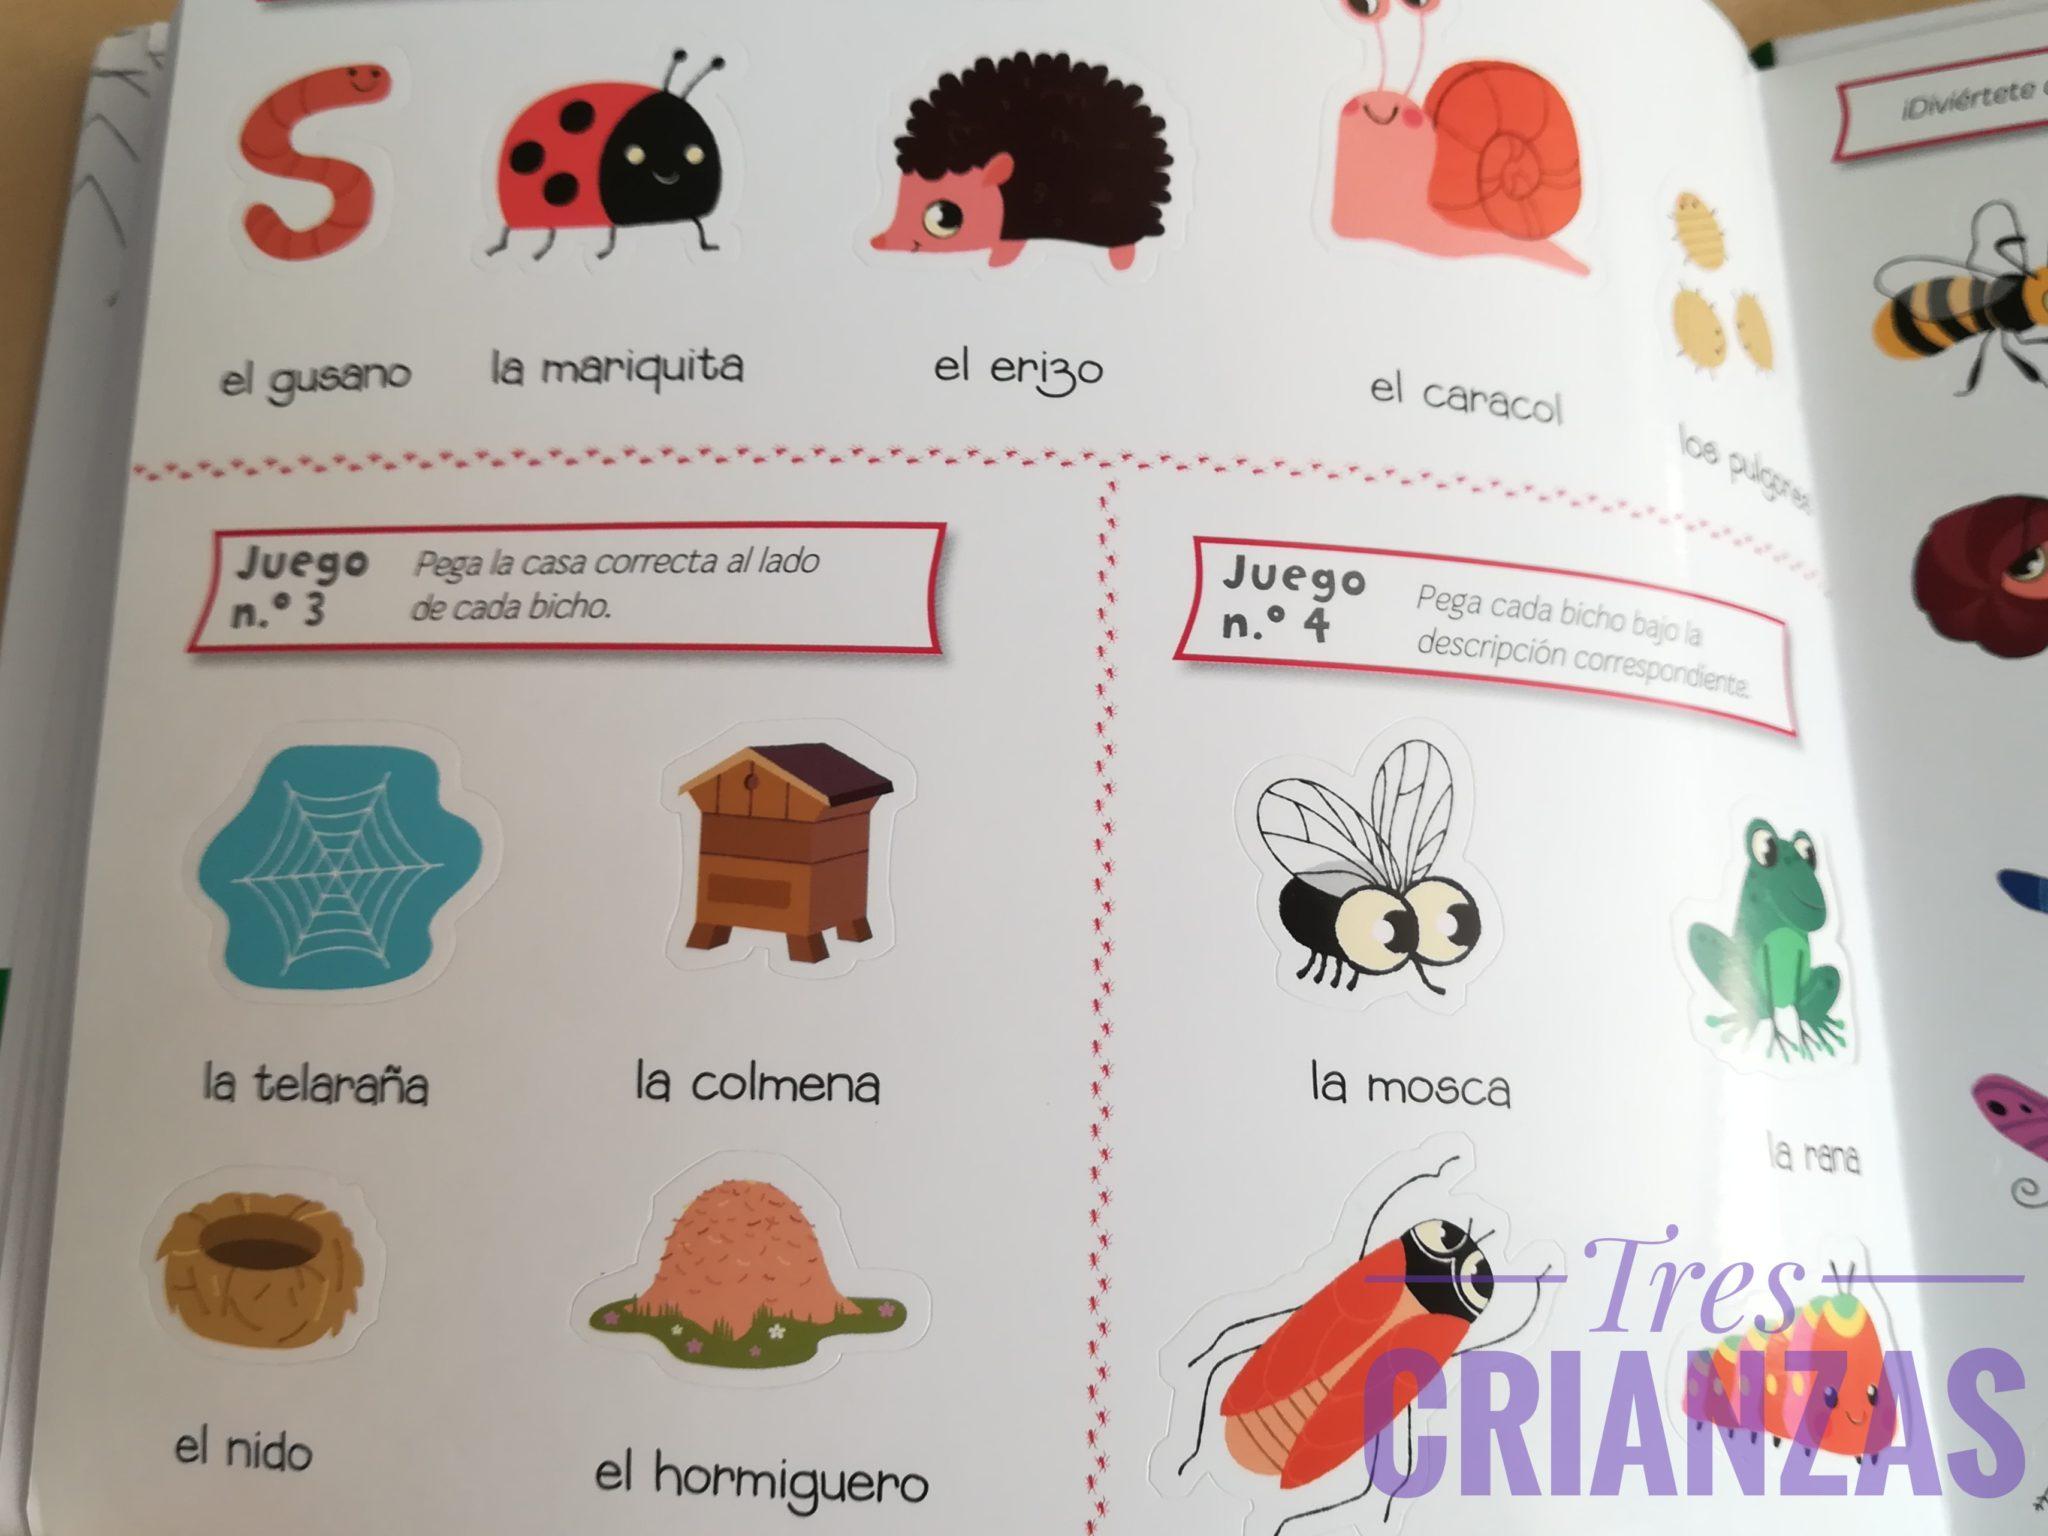 IMG 20180401 143312 01 1 - Cuentos para aprender bichos. Baby Enciclopedia Larousse.